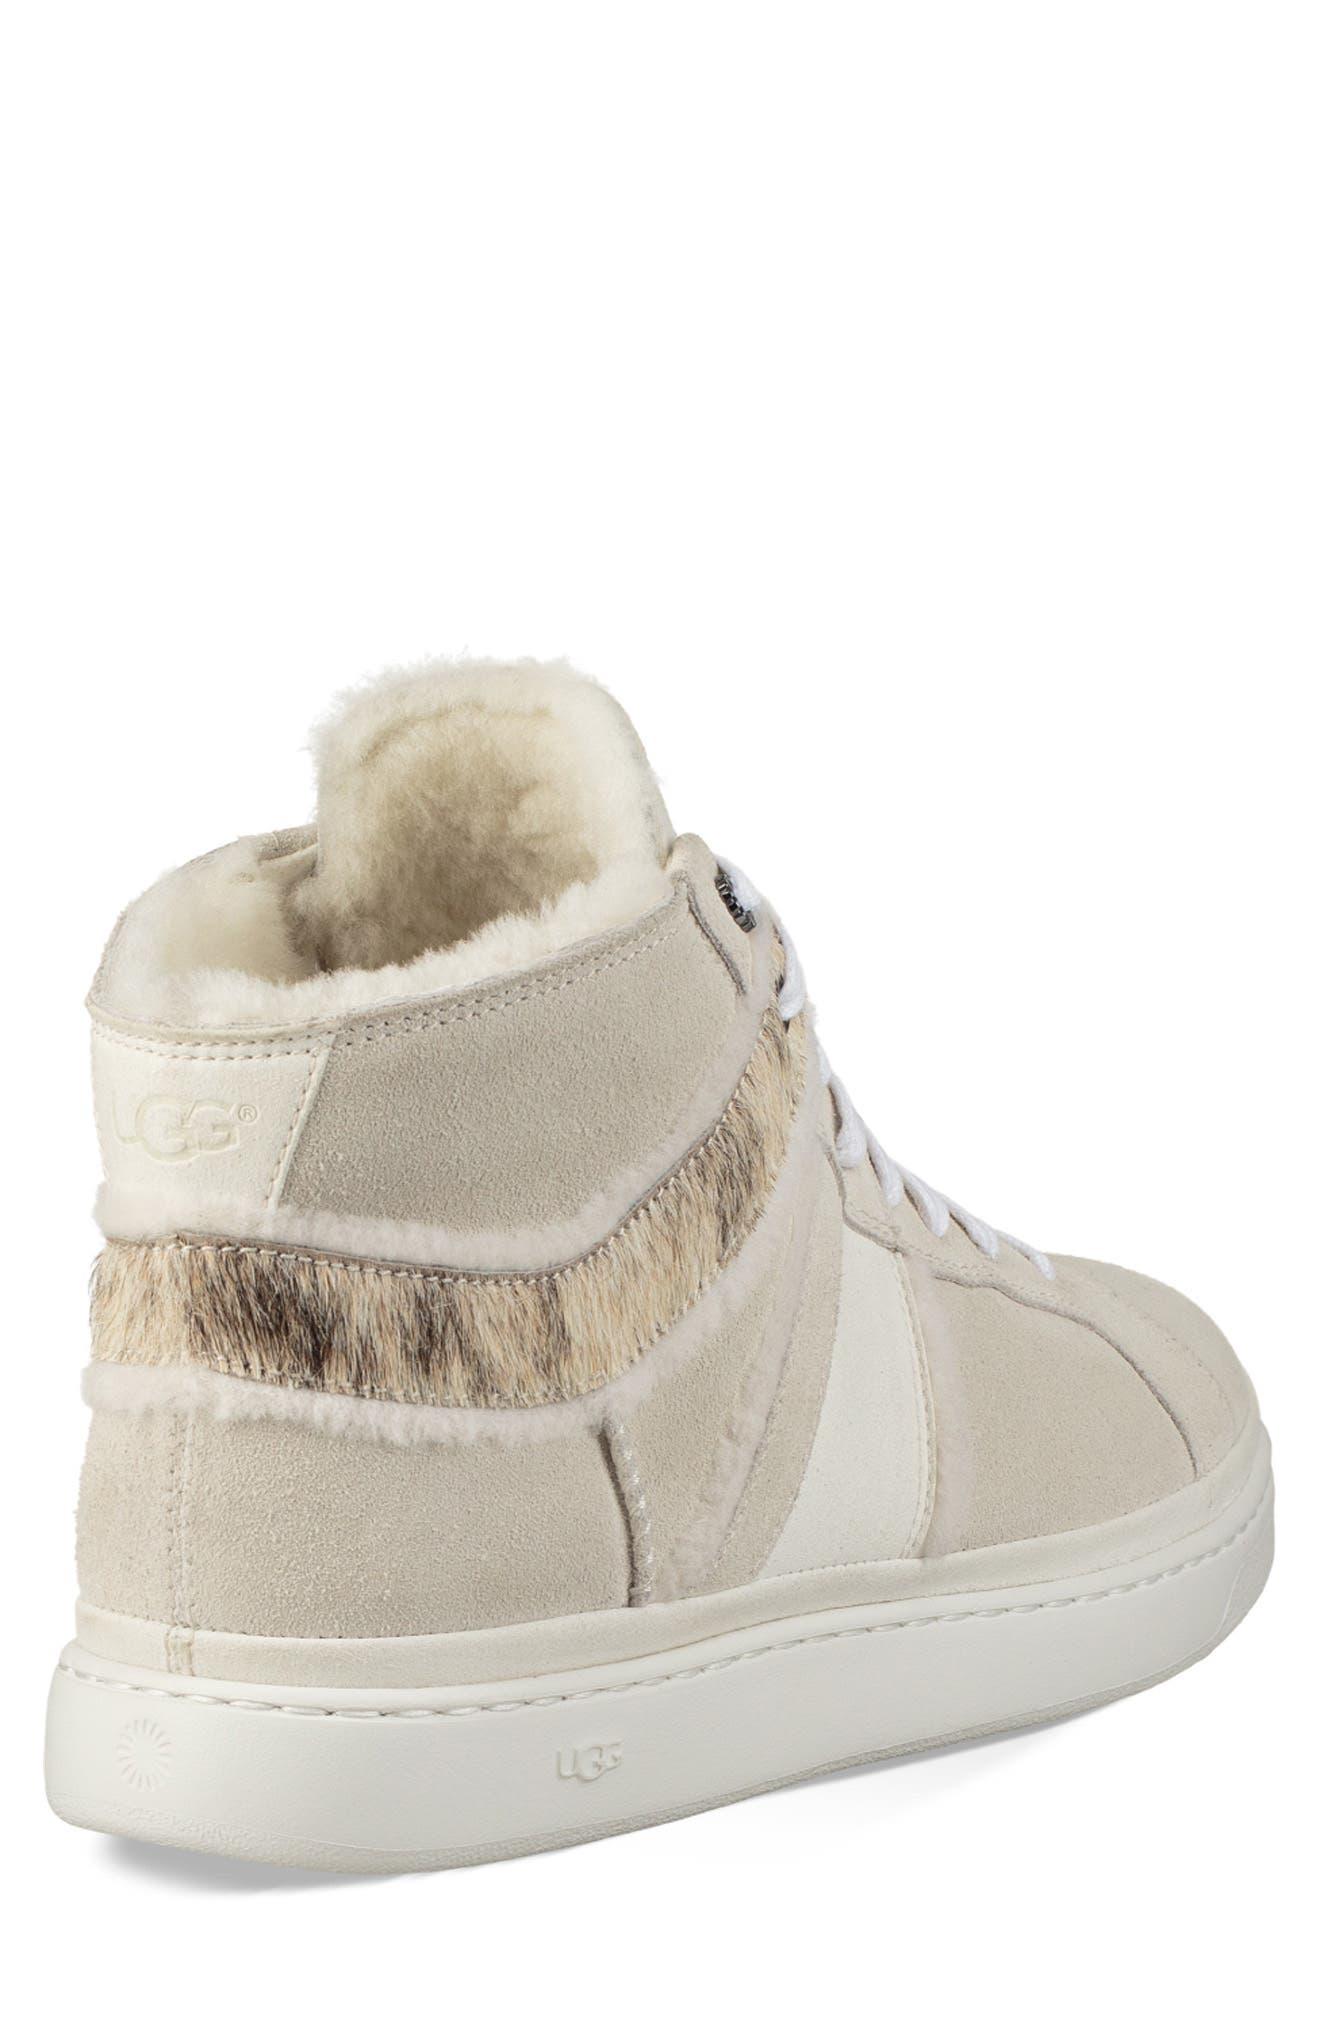 Cali High Top Sneaker,                             Alternate thumbnail 2, color,                             WHITE